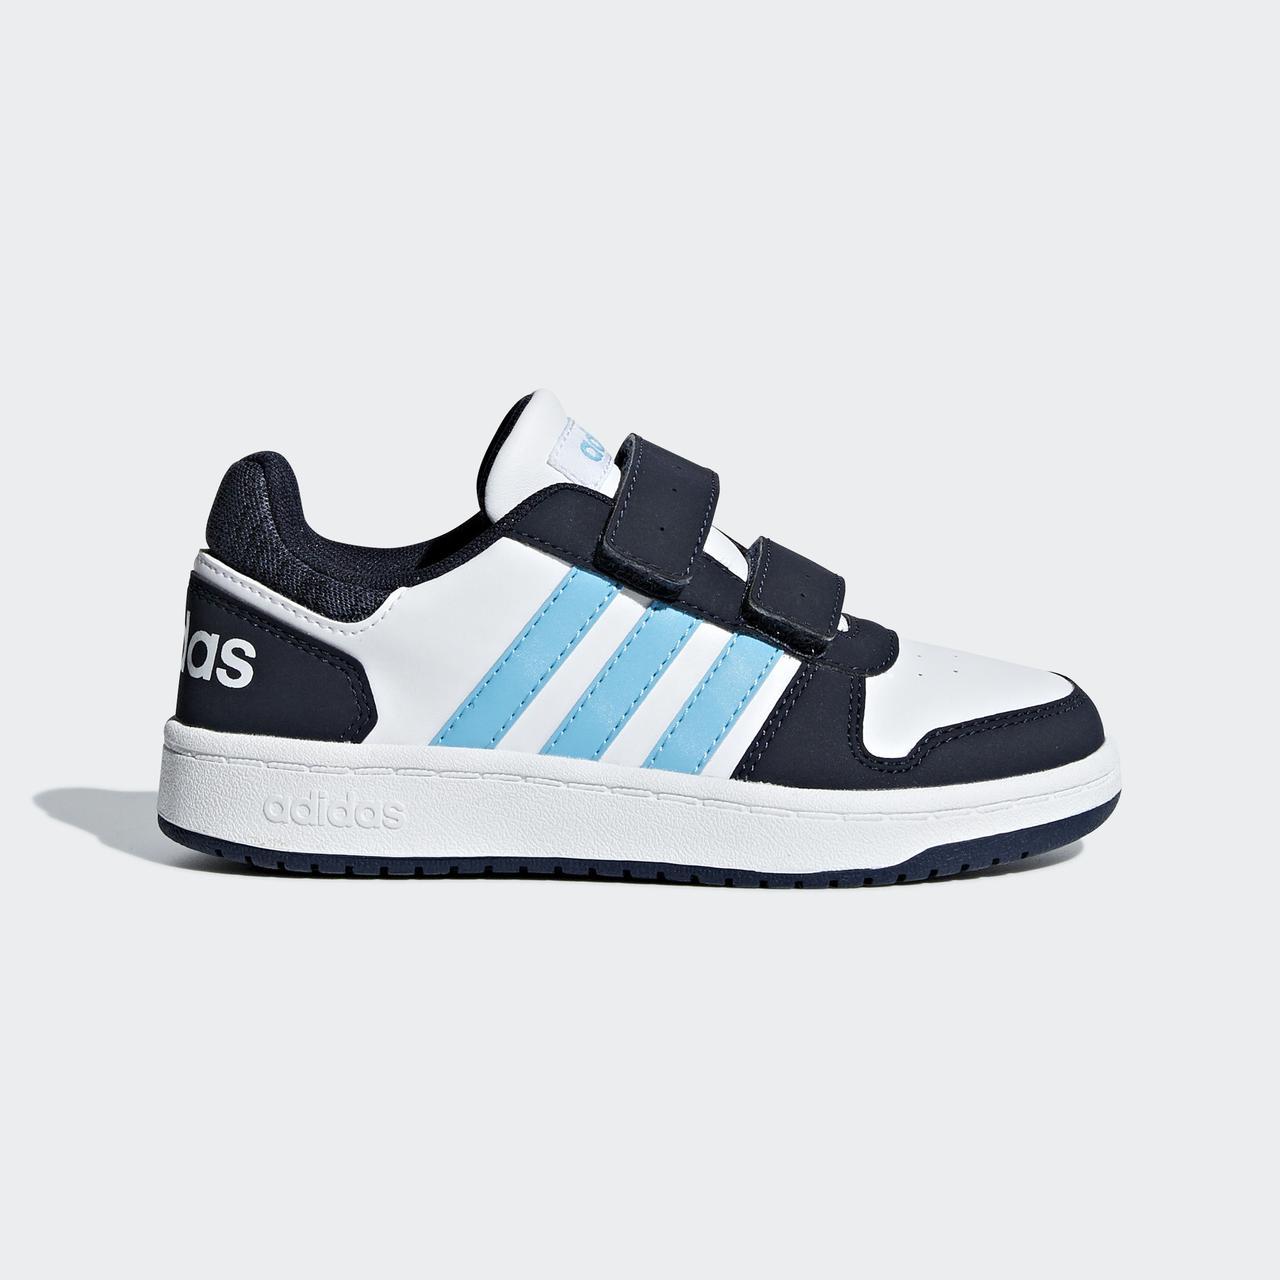 6cb07e6f9 Детские кроссовки Adidas Neo Hoops 2.0 (Артикул: BB7333) - Интернет-магазин  «